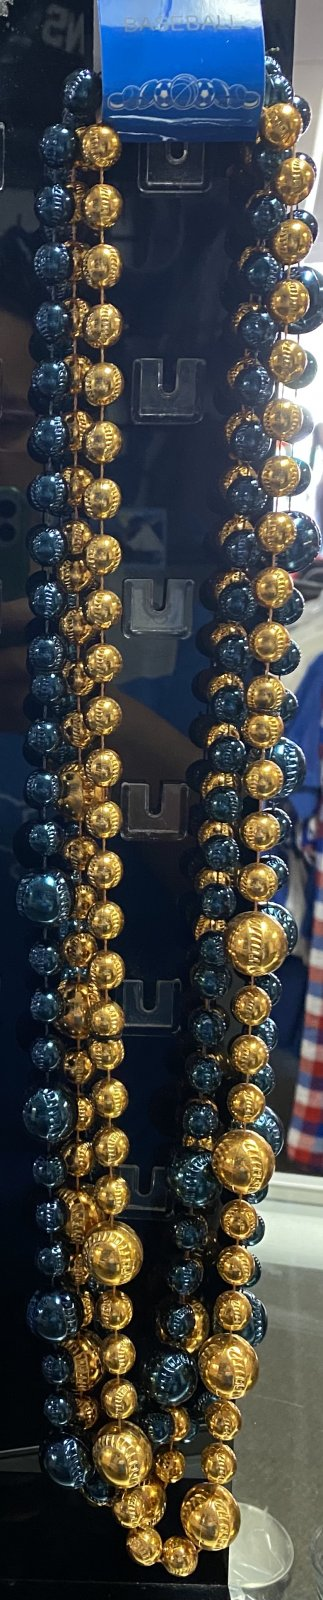 Detroit Tigers Baseball Team Beads